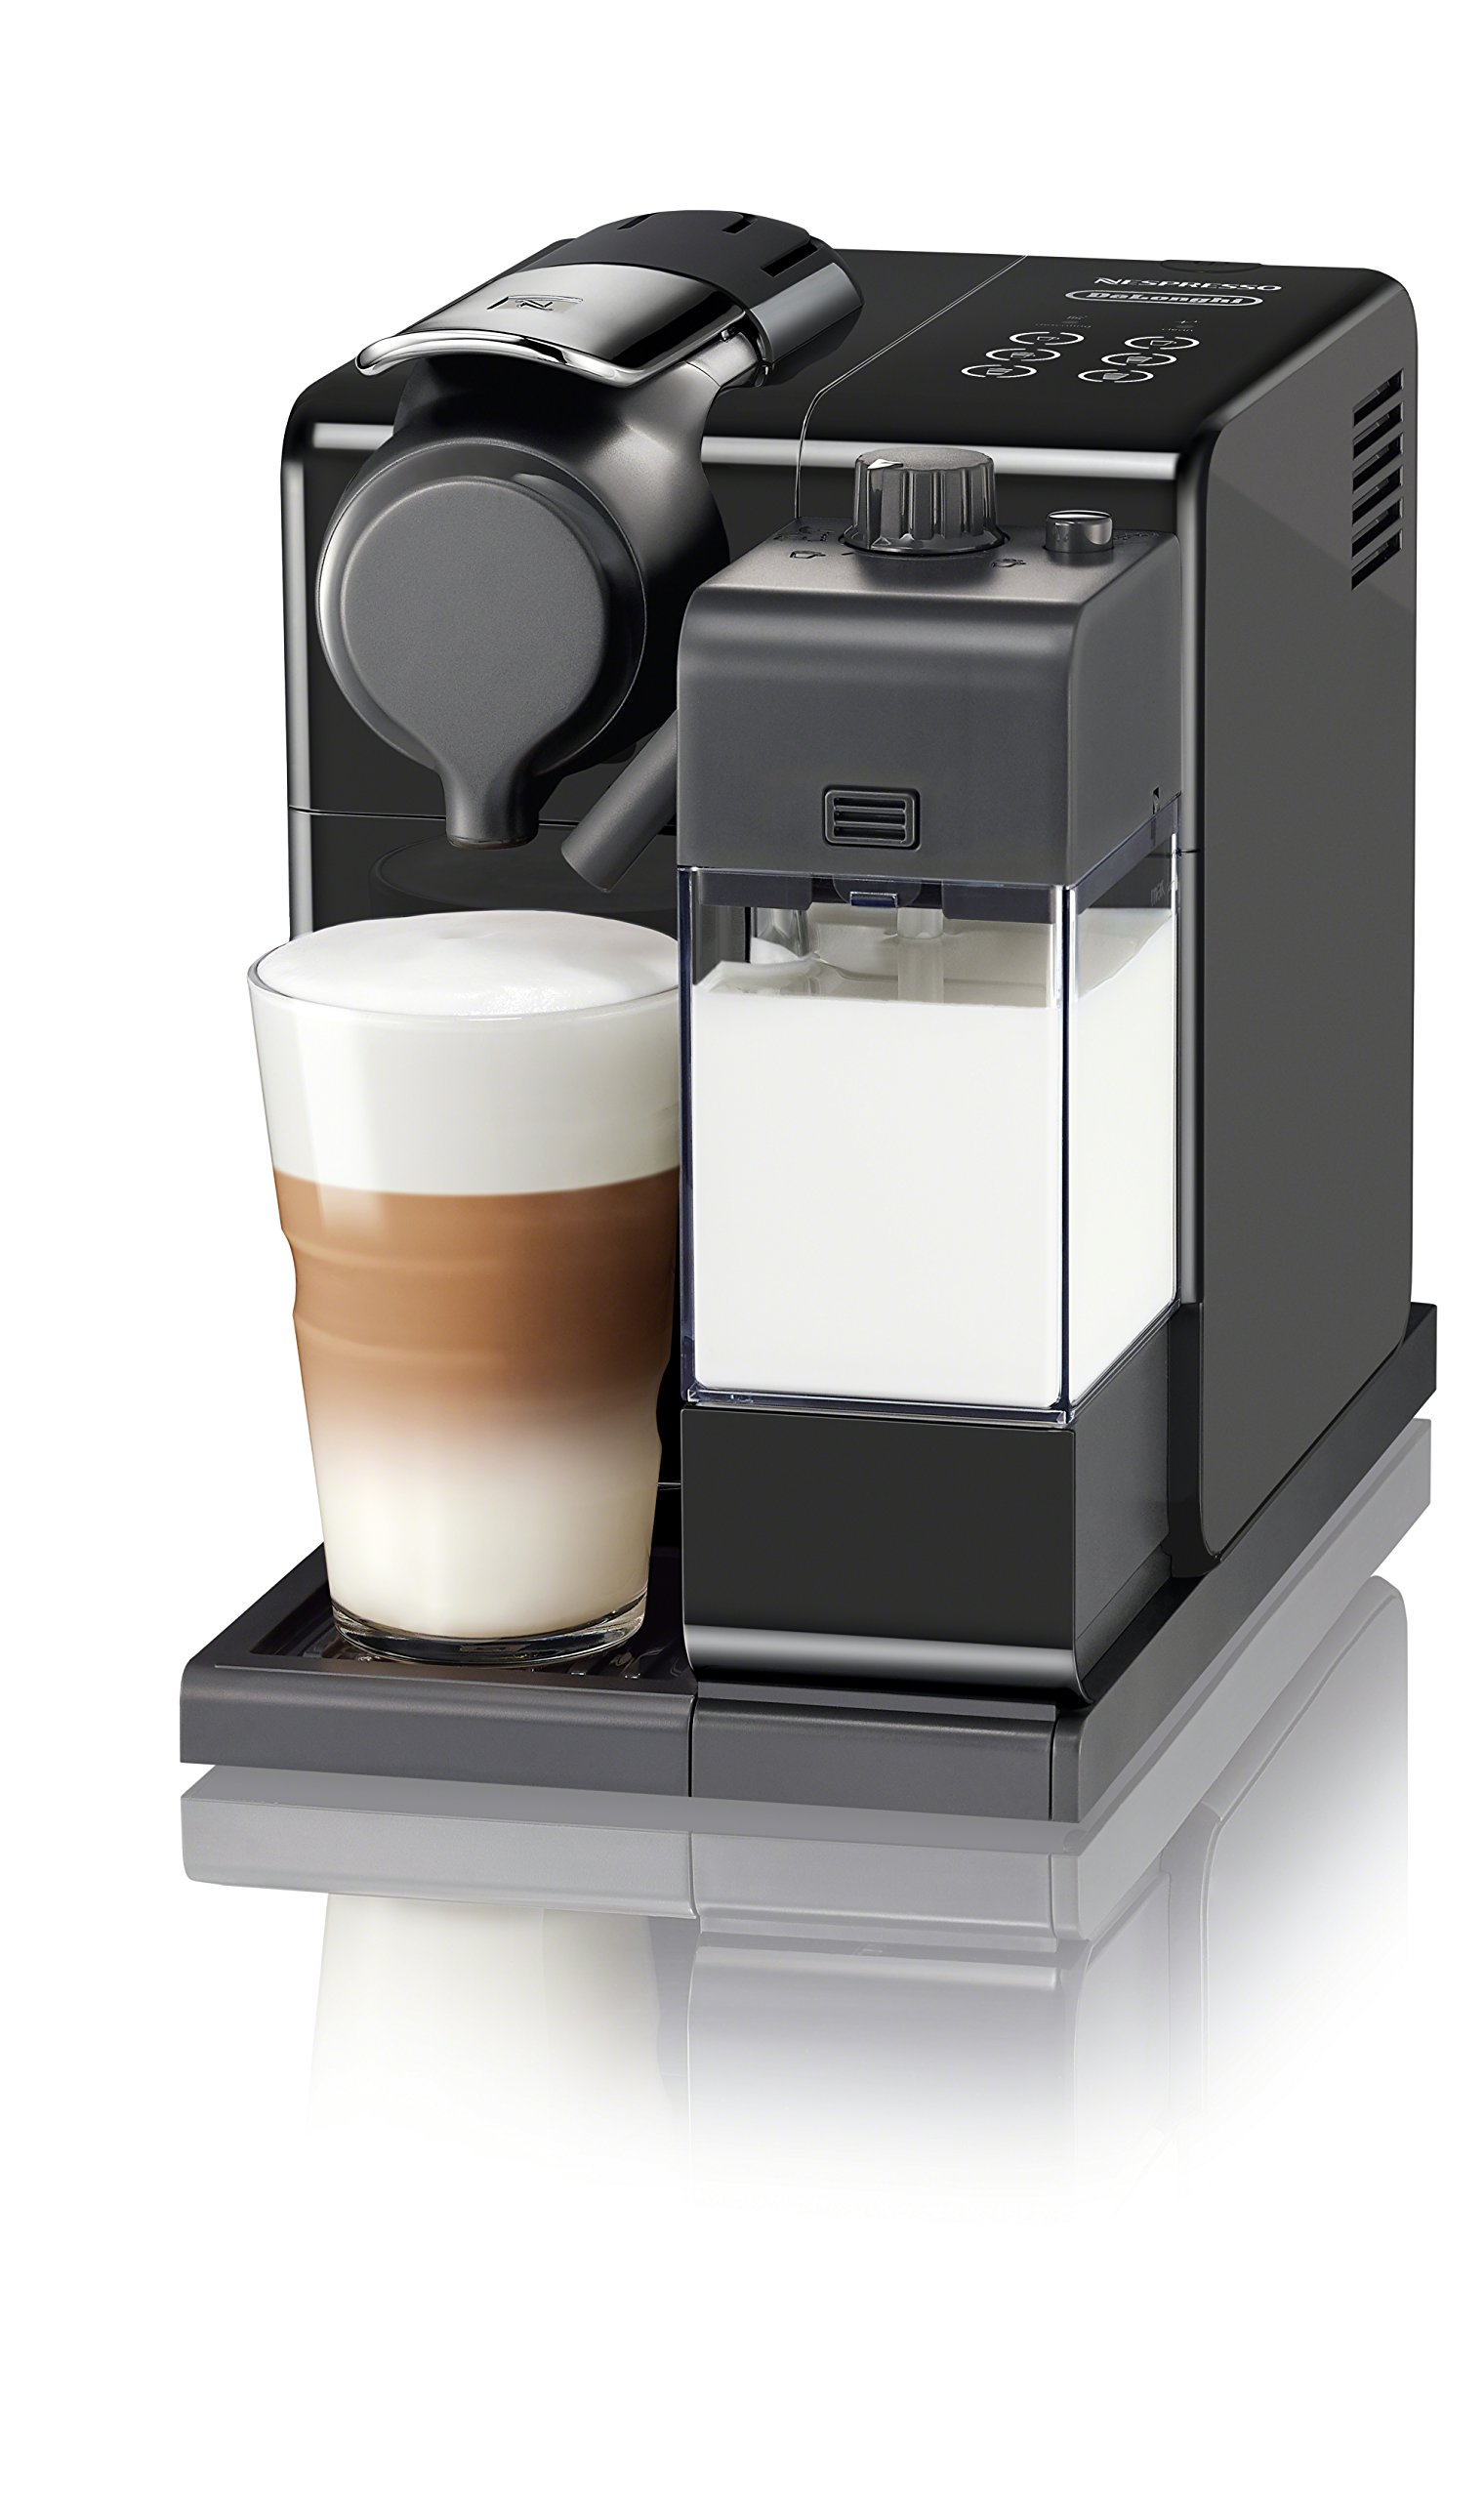 Nespresso by De'Longhi EN560B Lattissima Touch Original Espresso Machine with Milk Frother by De'Longhi, Washed Black by Nespresso by De'Longhi